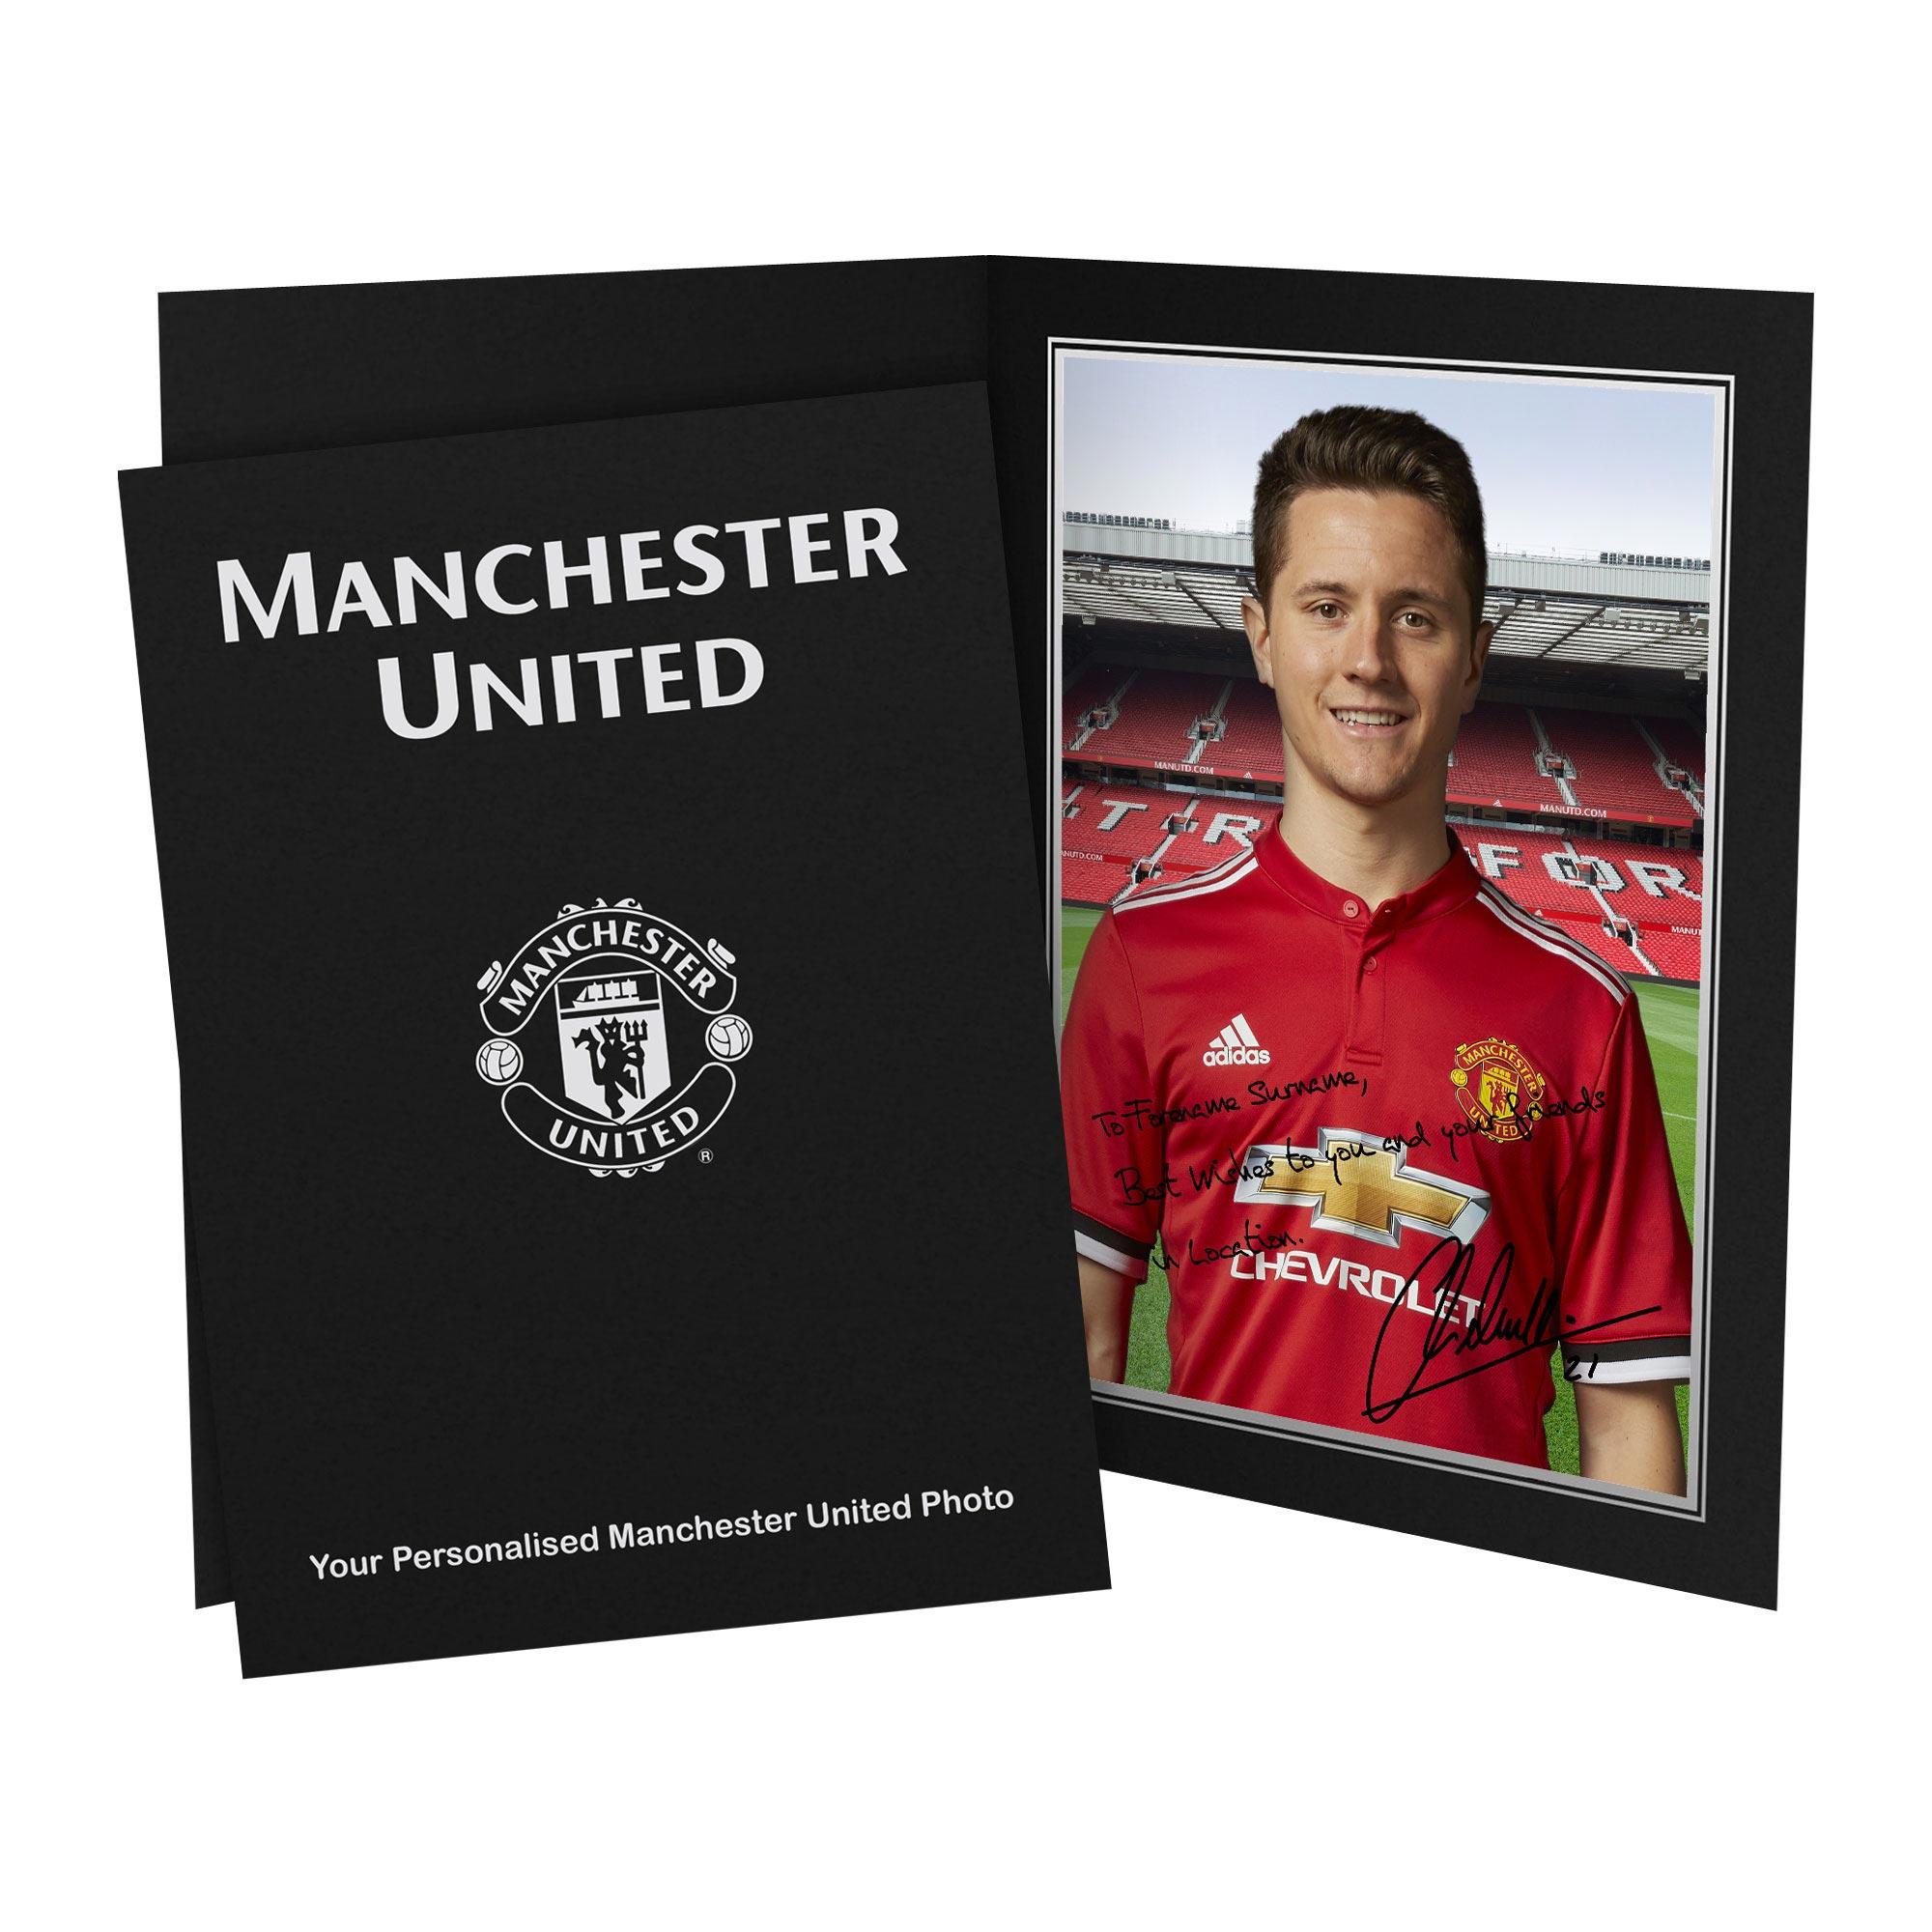 Manchester United Personalised Signature Photo in Presentation Folder - Herrera